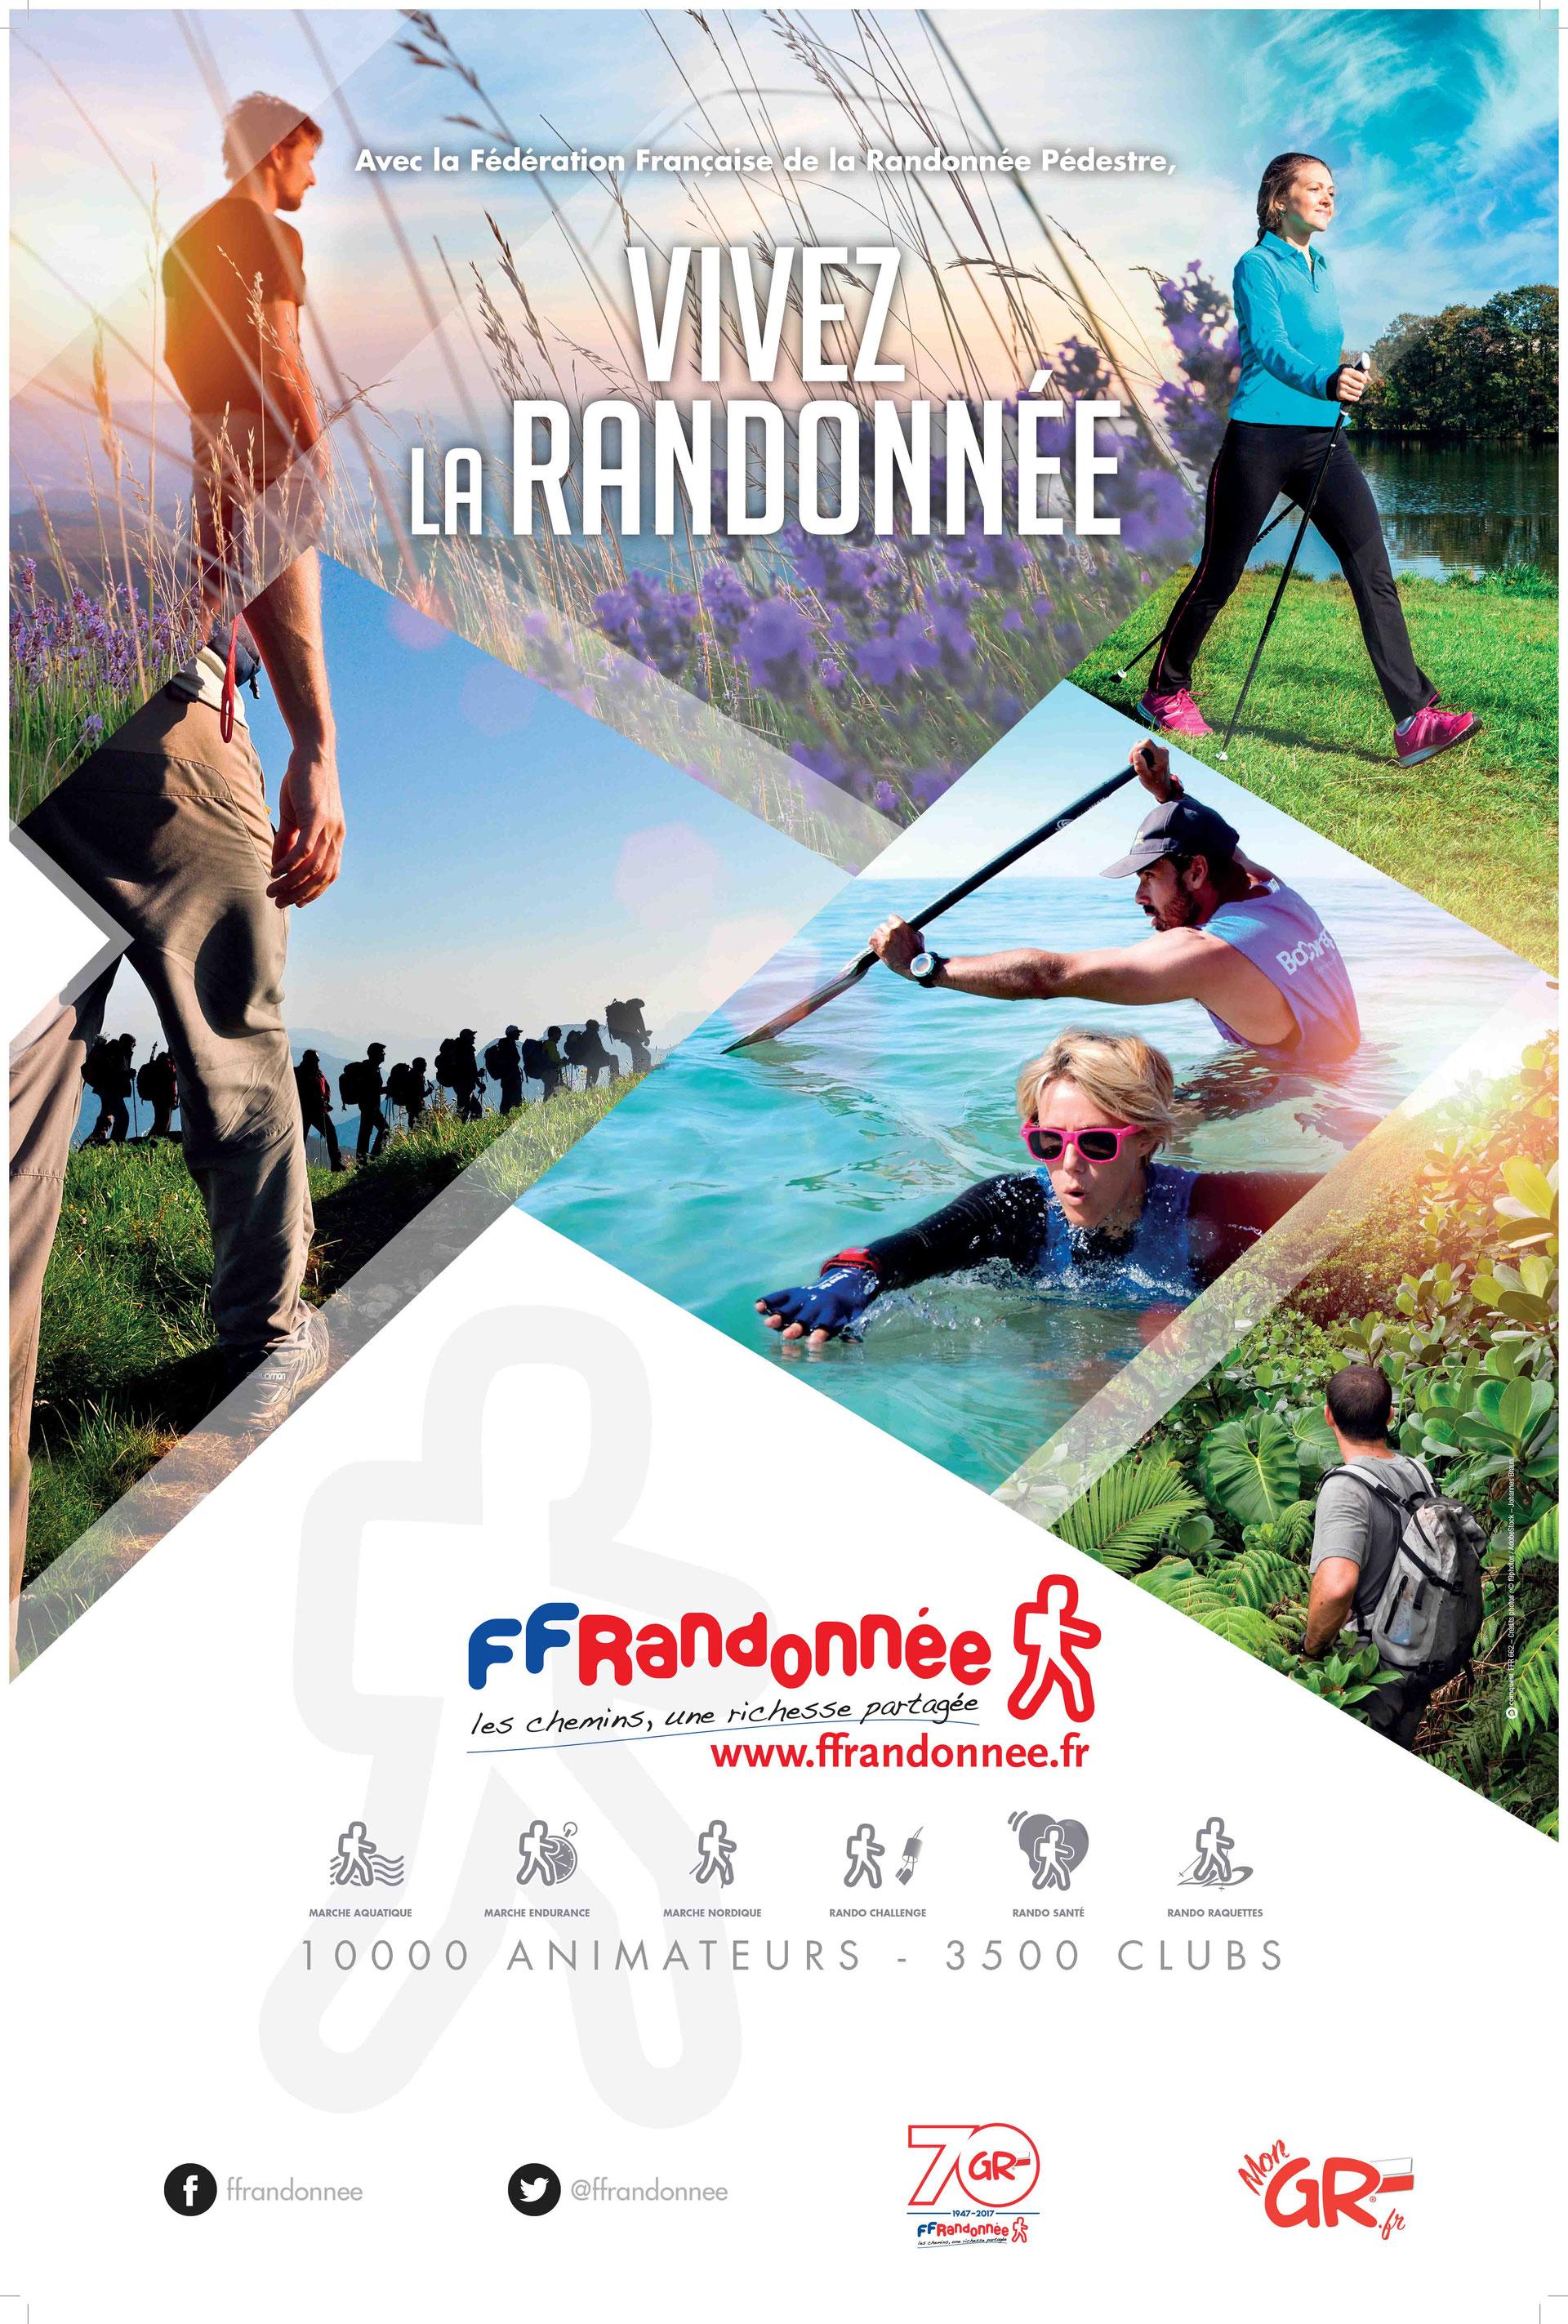 Calendrier Randonnee Pedestre Lot Et Garonne.Comite Departemental De La Randonnee Pedestre Sentiers 47